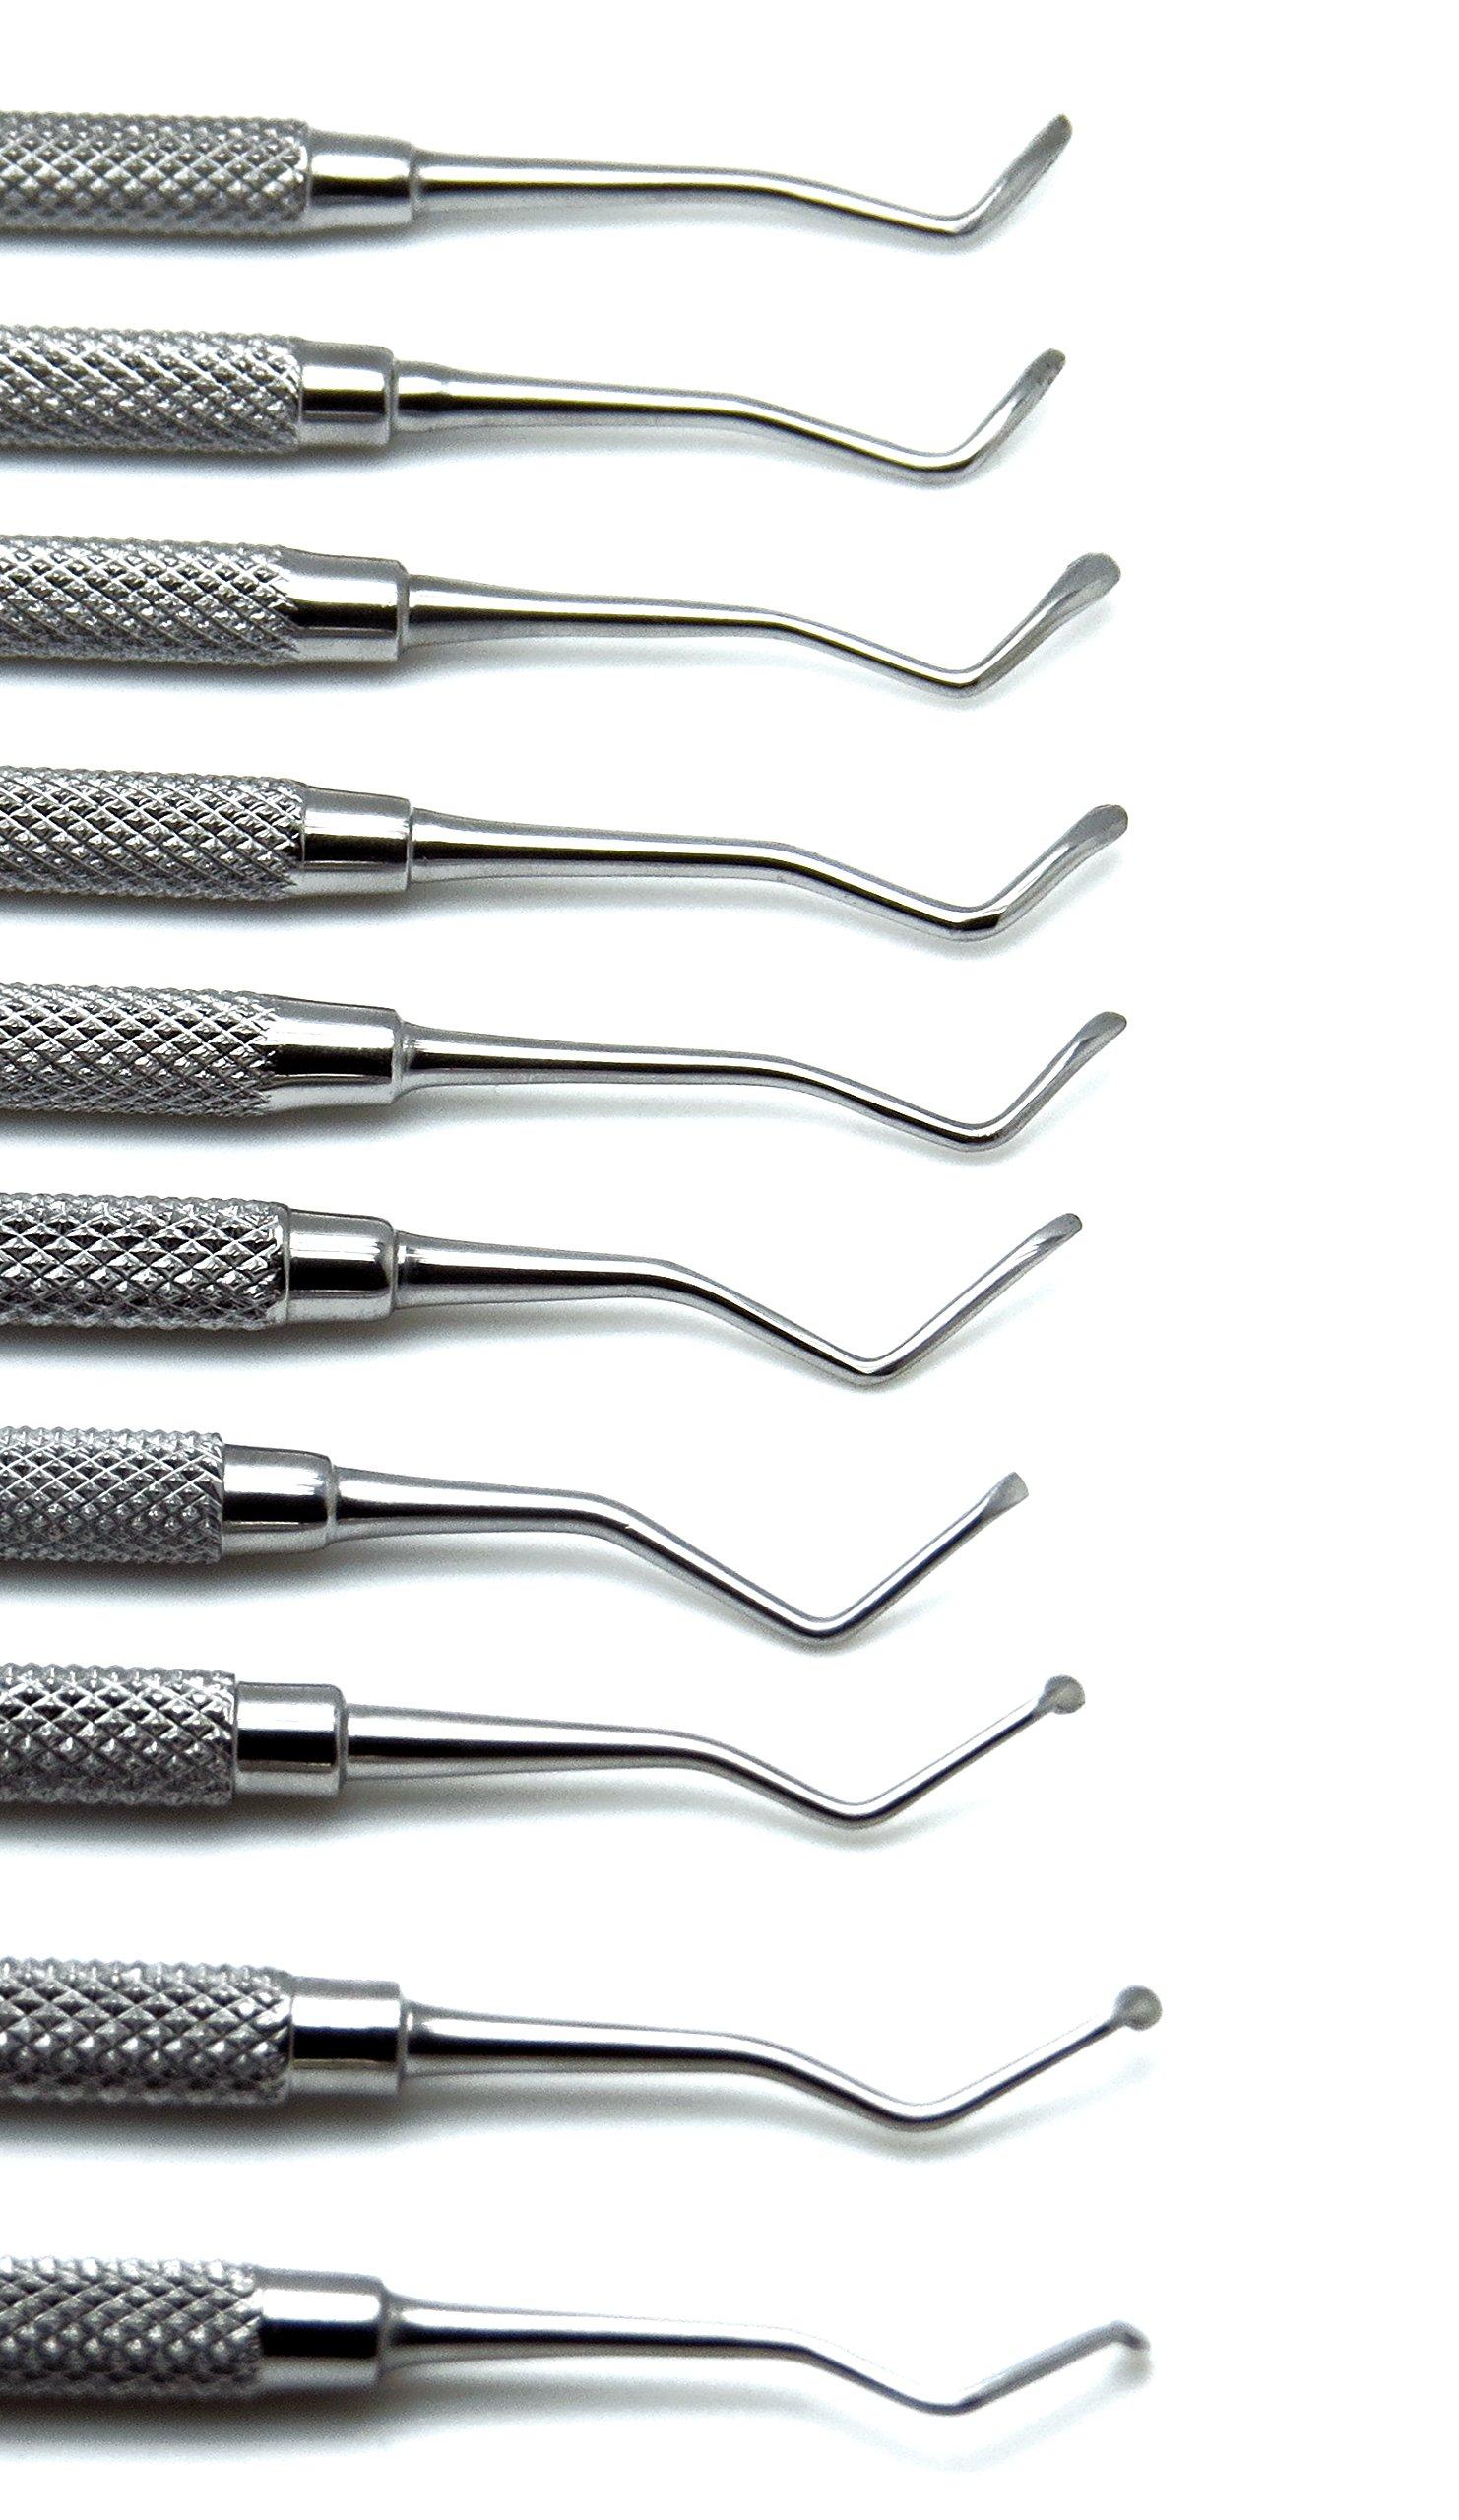 10 Pcs Dental Superior Excavator Spoon Ends 1mm-2.5mm Restorative Instrument by Superior (Image #4)